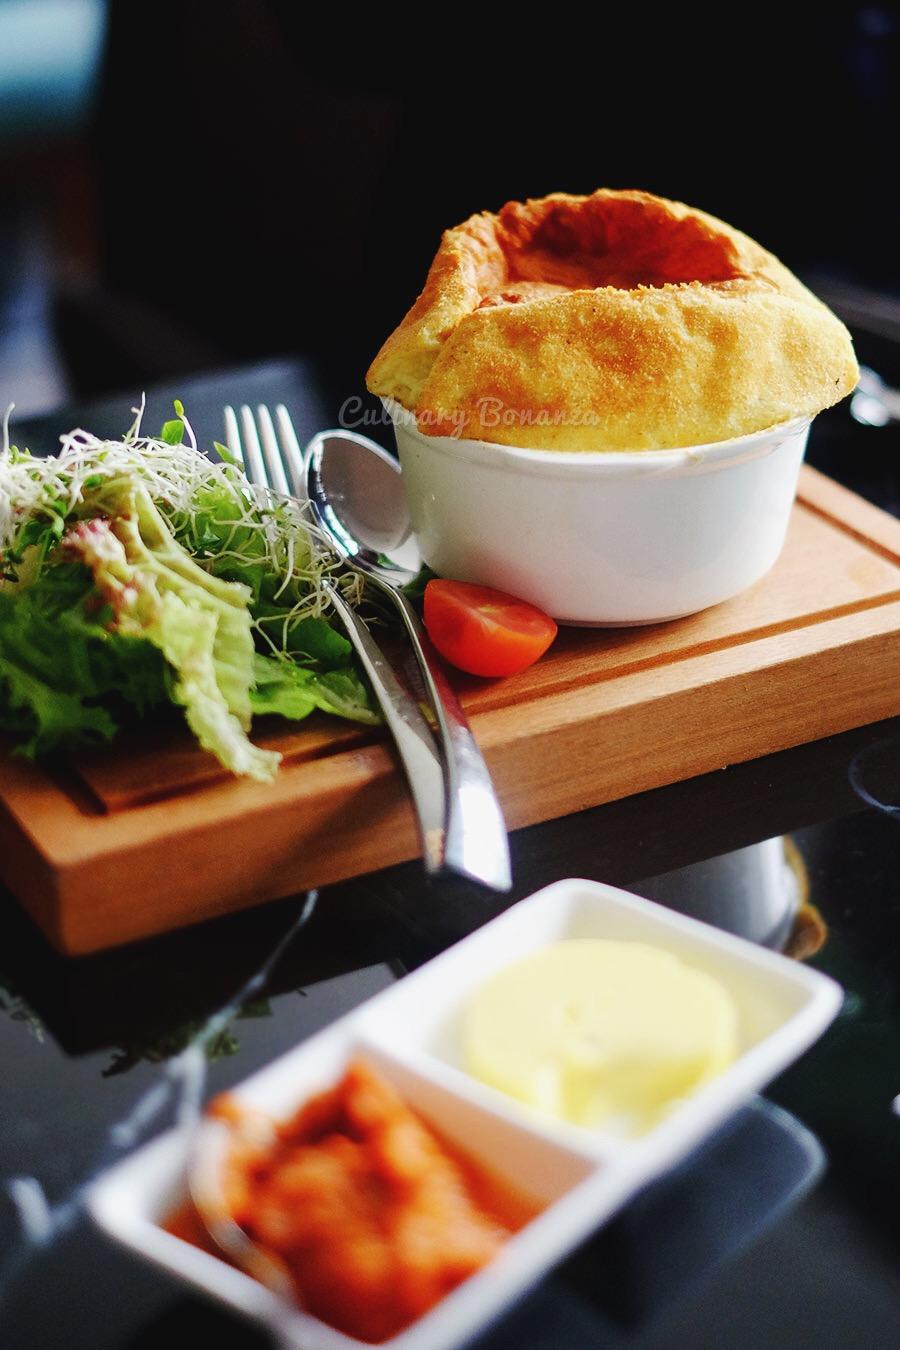 Truffled Cheese Souffle (www.culinarybonanza.com)